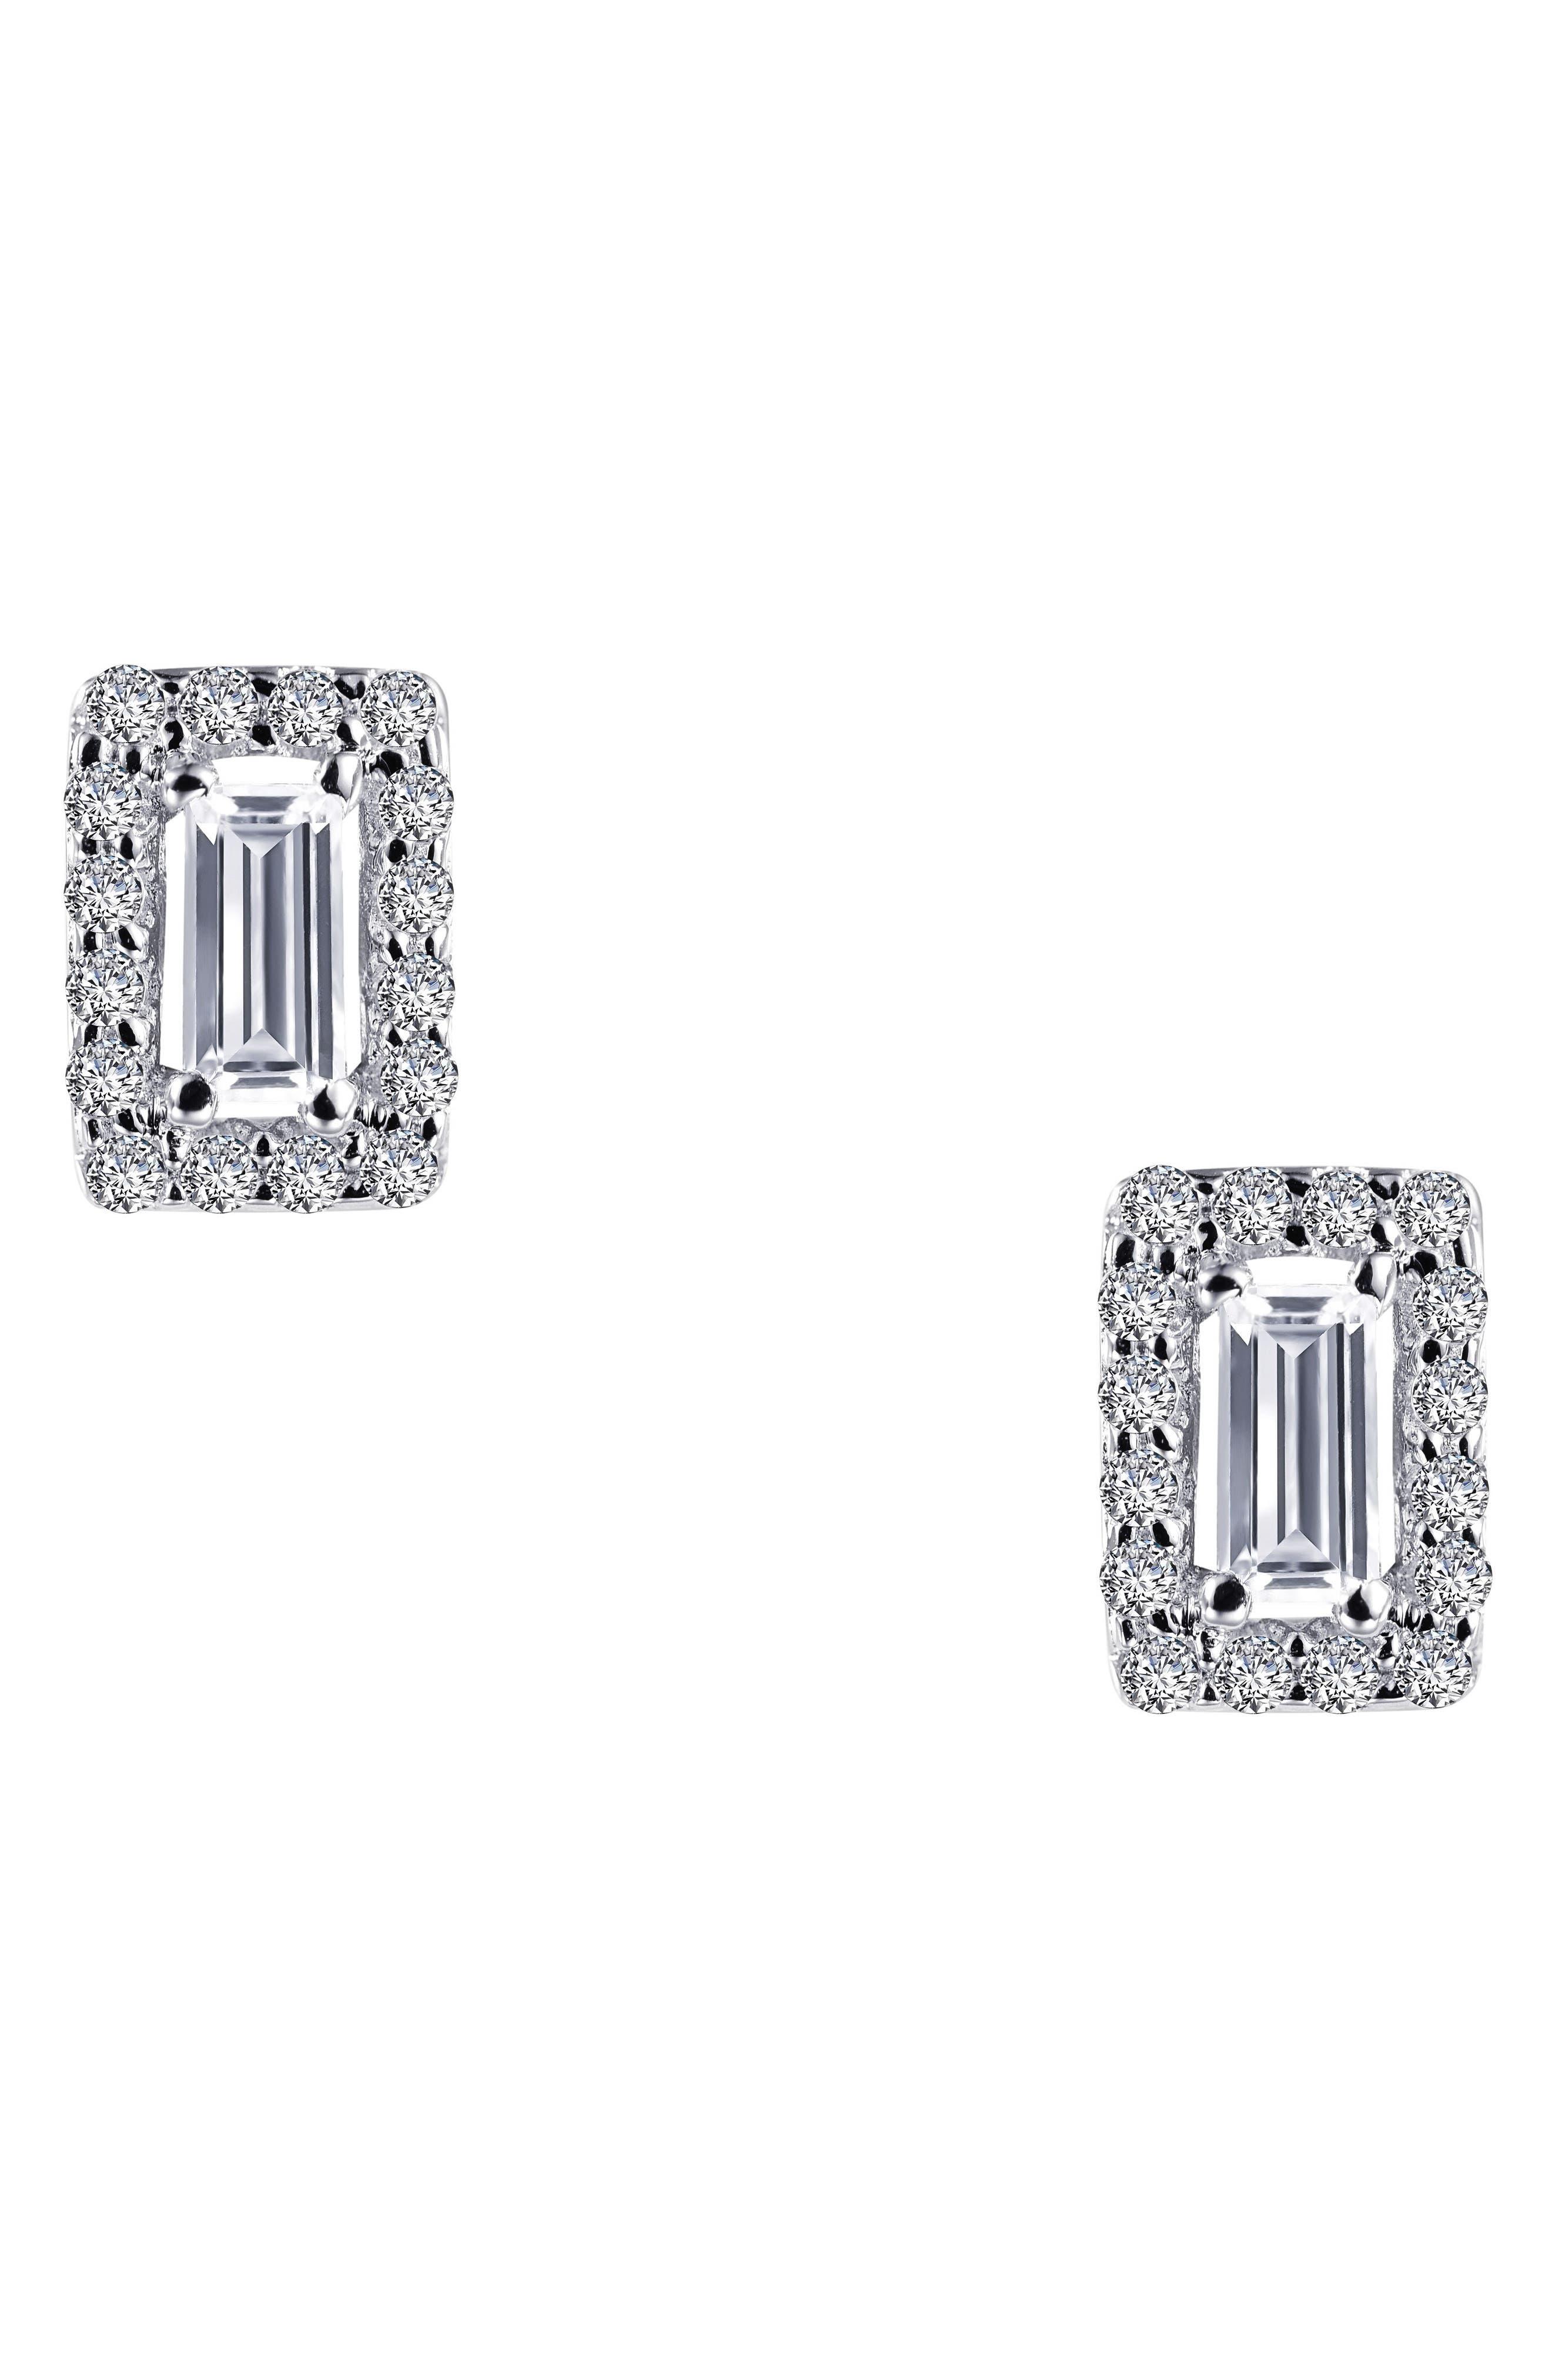 Crystal Baguette Simulated Diamond Stud Earrings,                             Alternate thumbnail 3, color,                             SILVER/ CLEAR